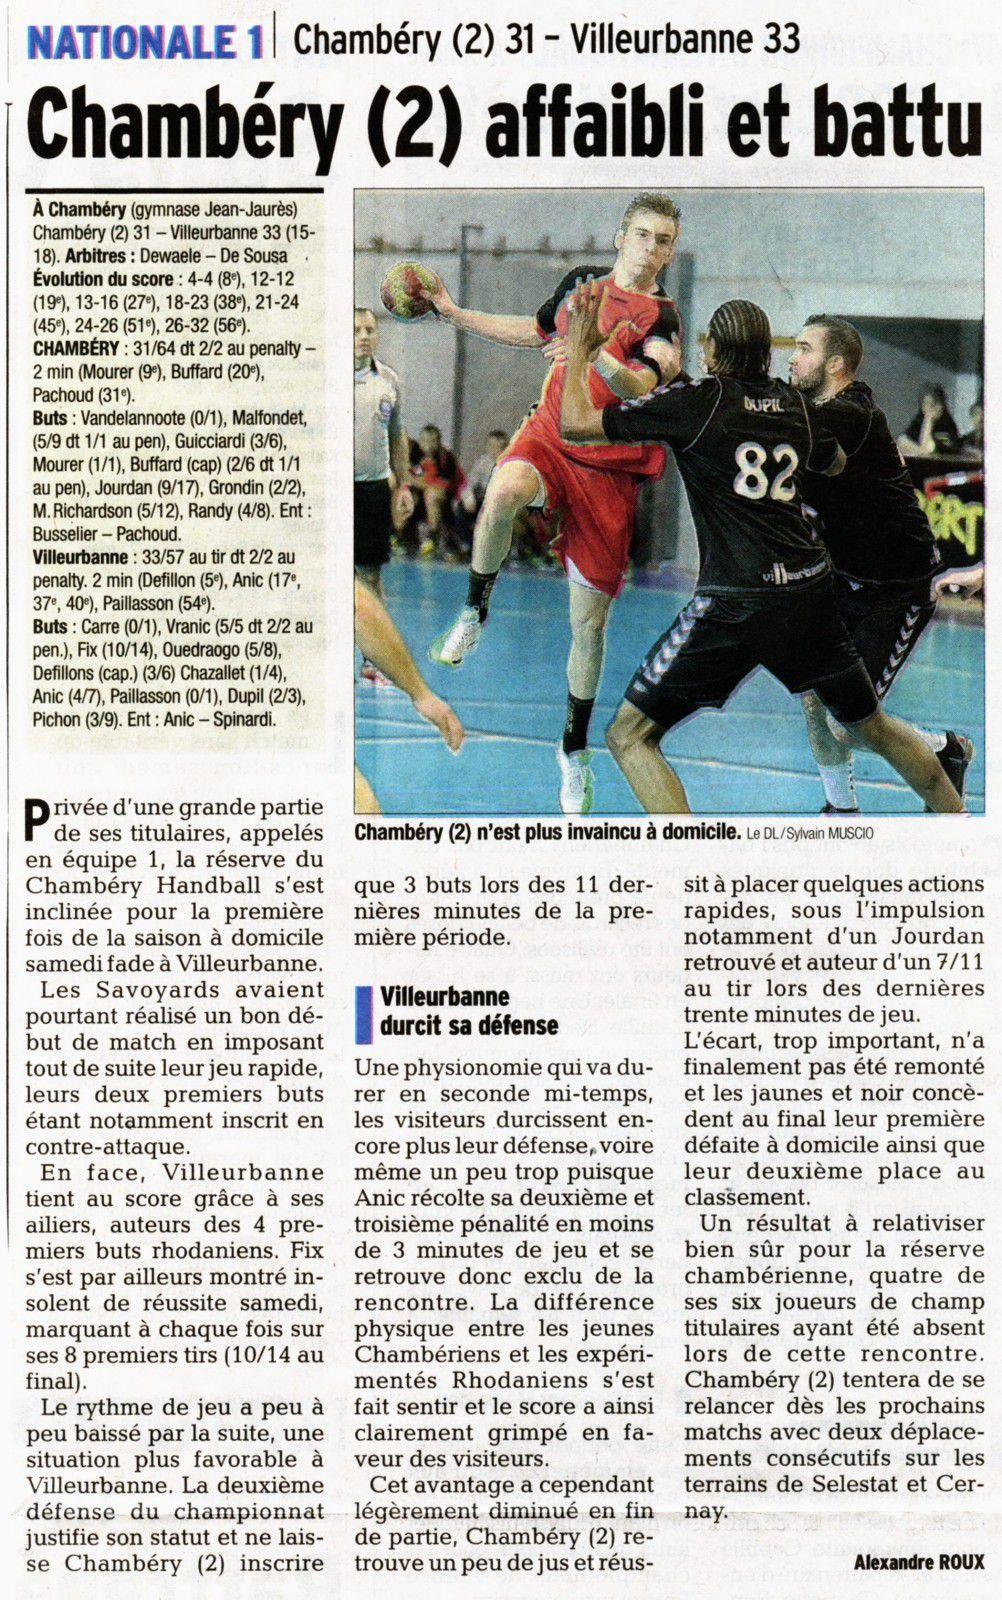 N1-article-CHAMBERY--VILLEURBANNE-18-01-2014-copie-1.jpg